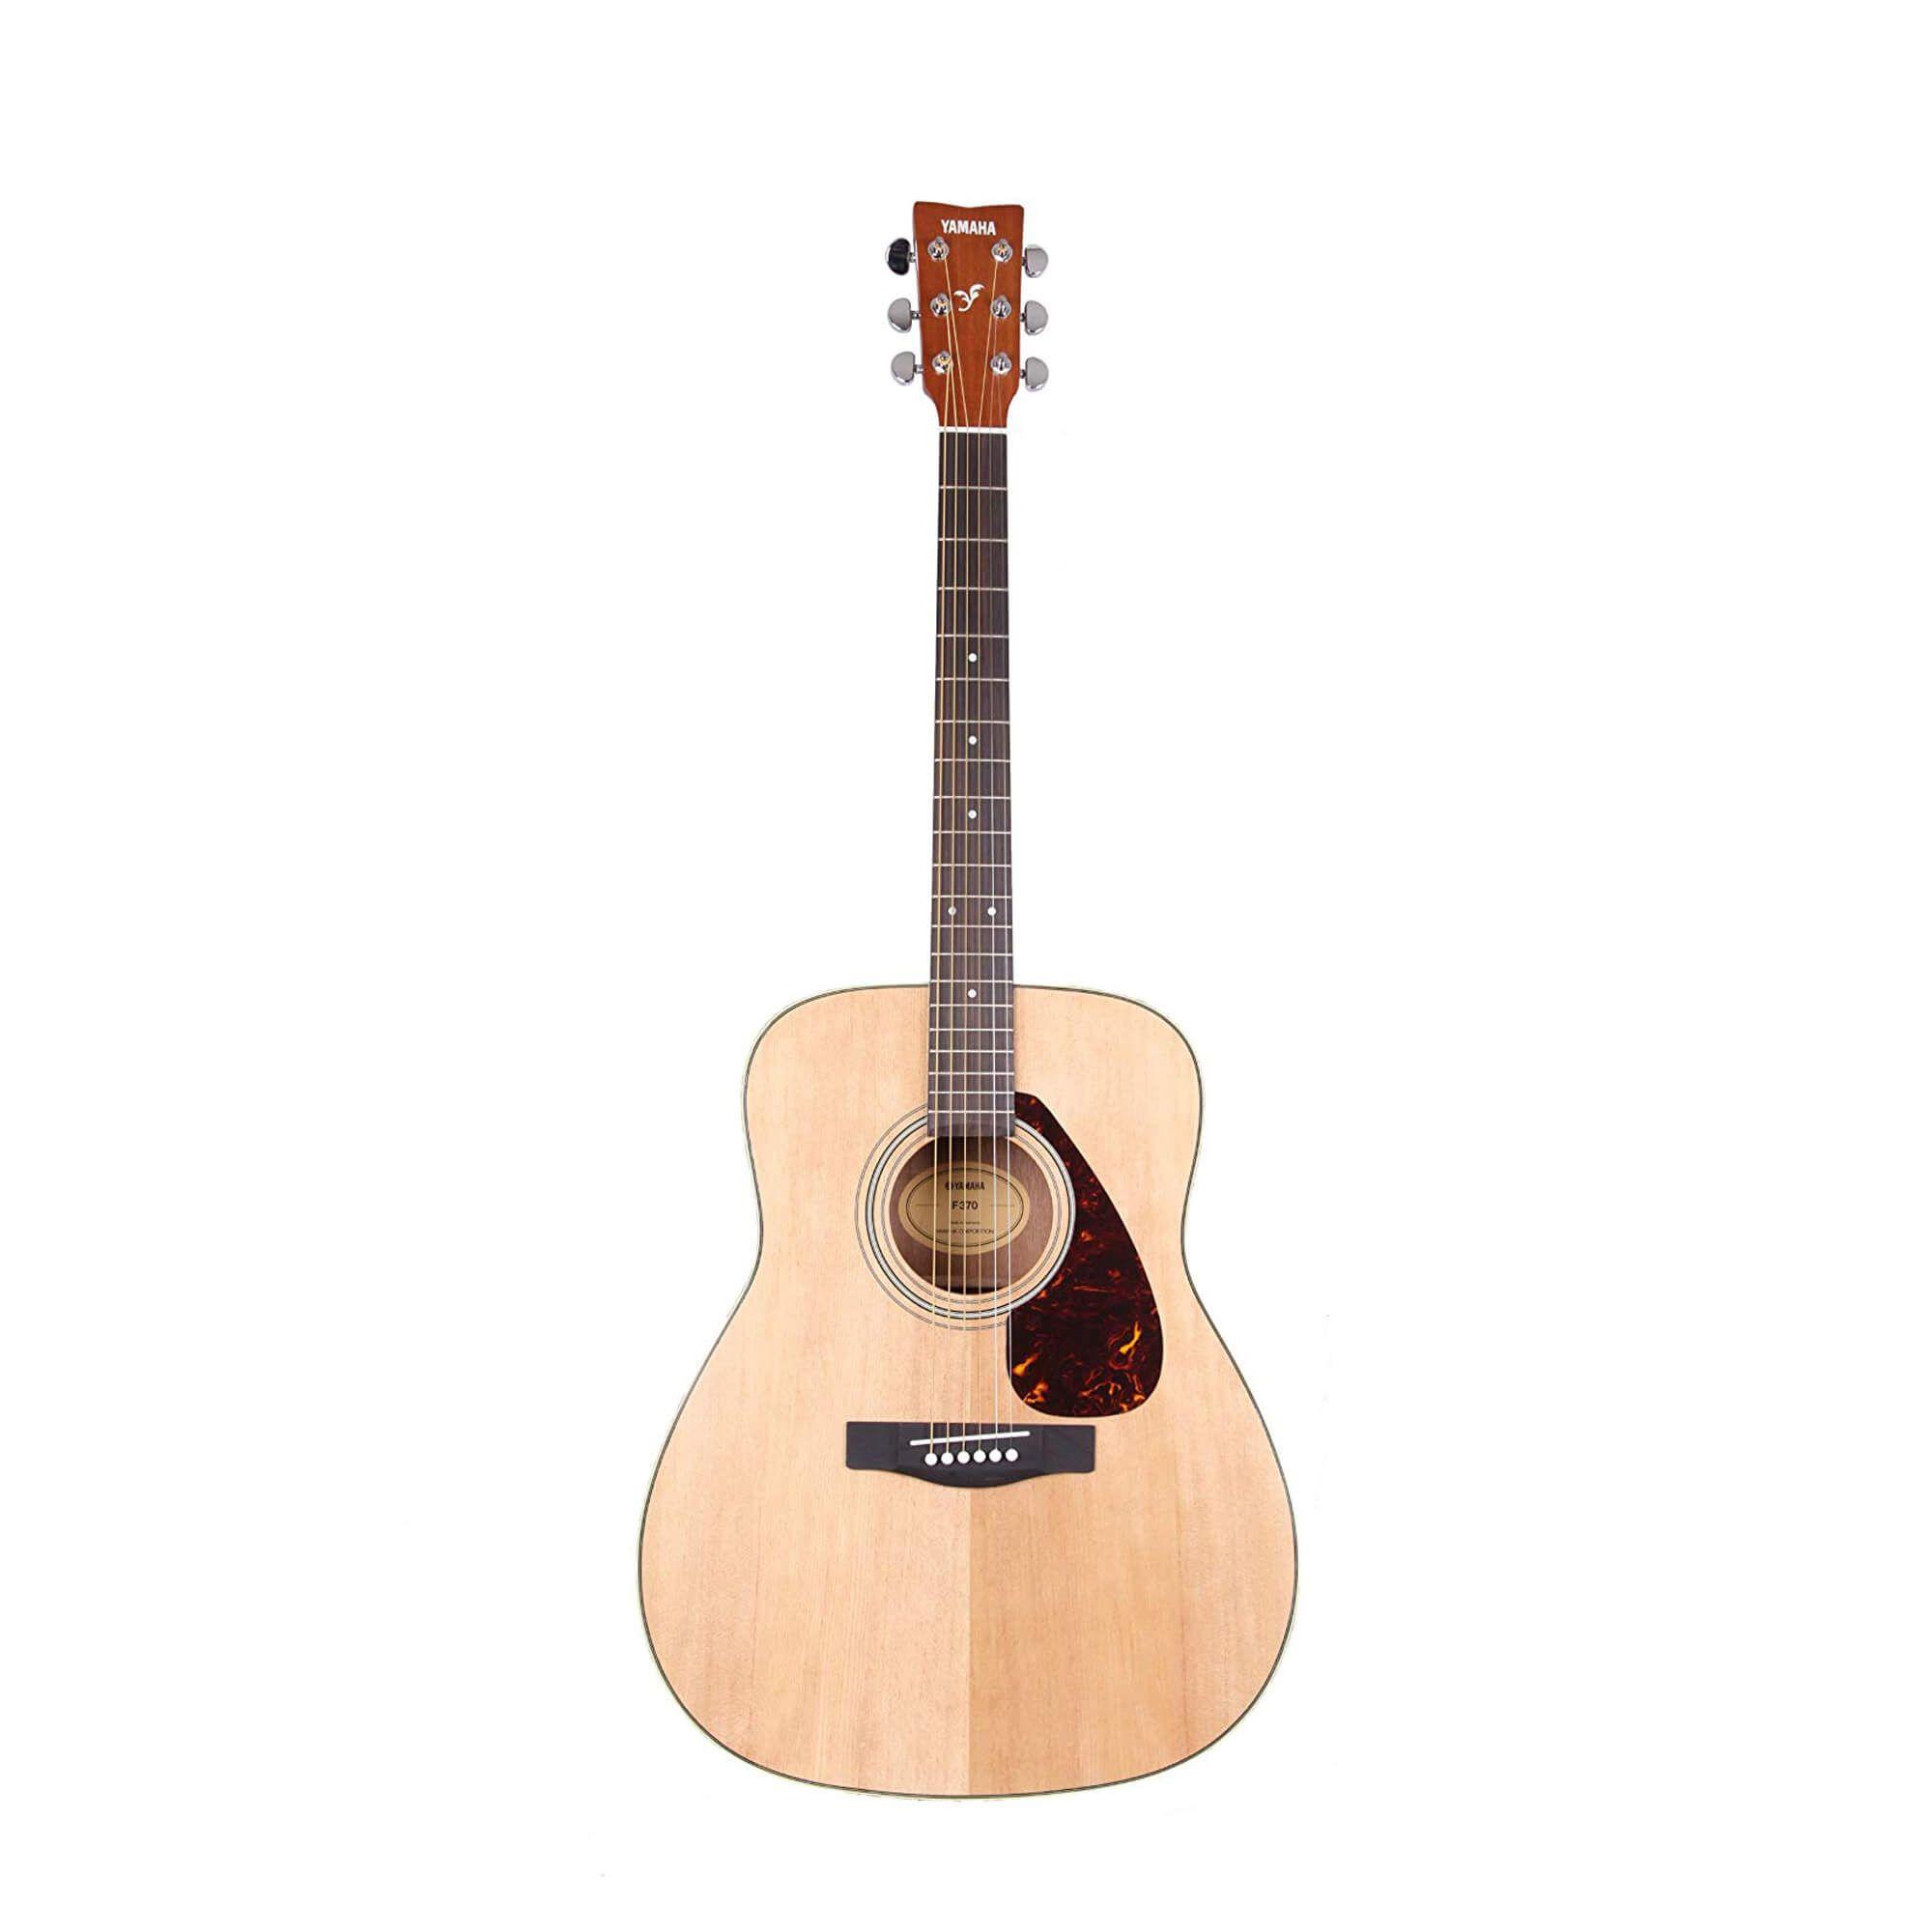 Yamaha F370 Acoustic Guitar Devmusical Acoustic Guitar Guitar Guitar Online